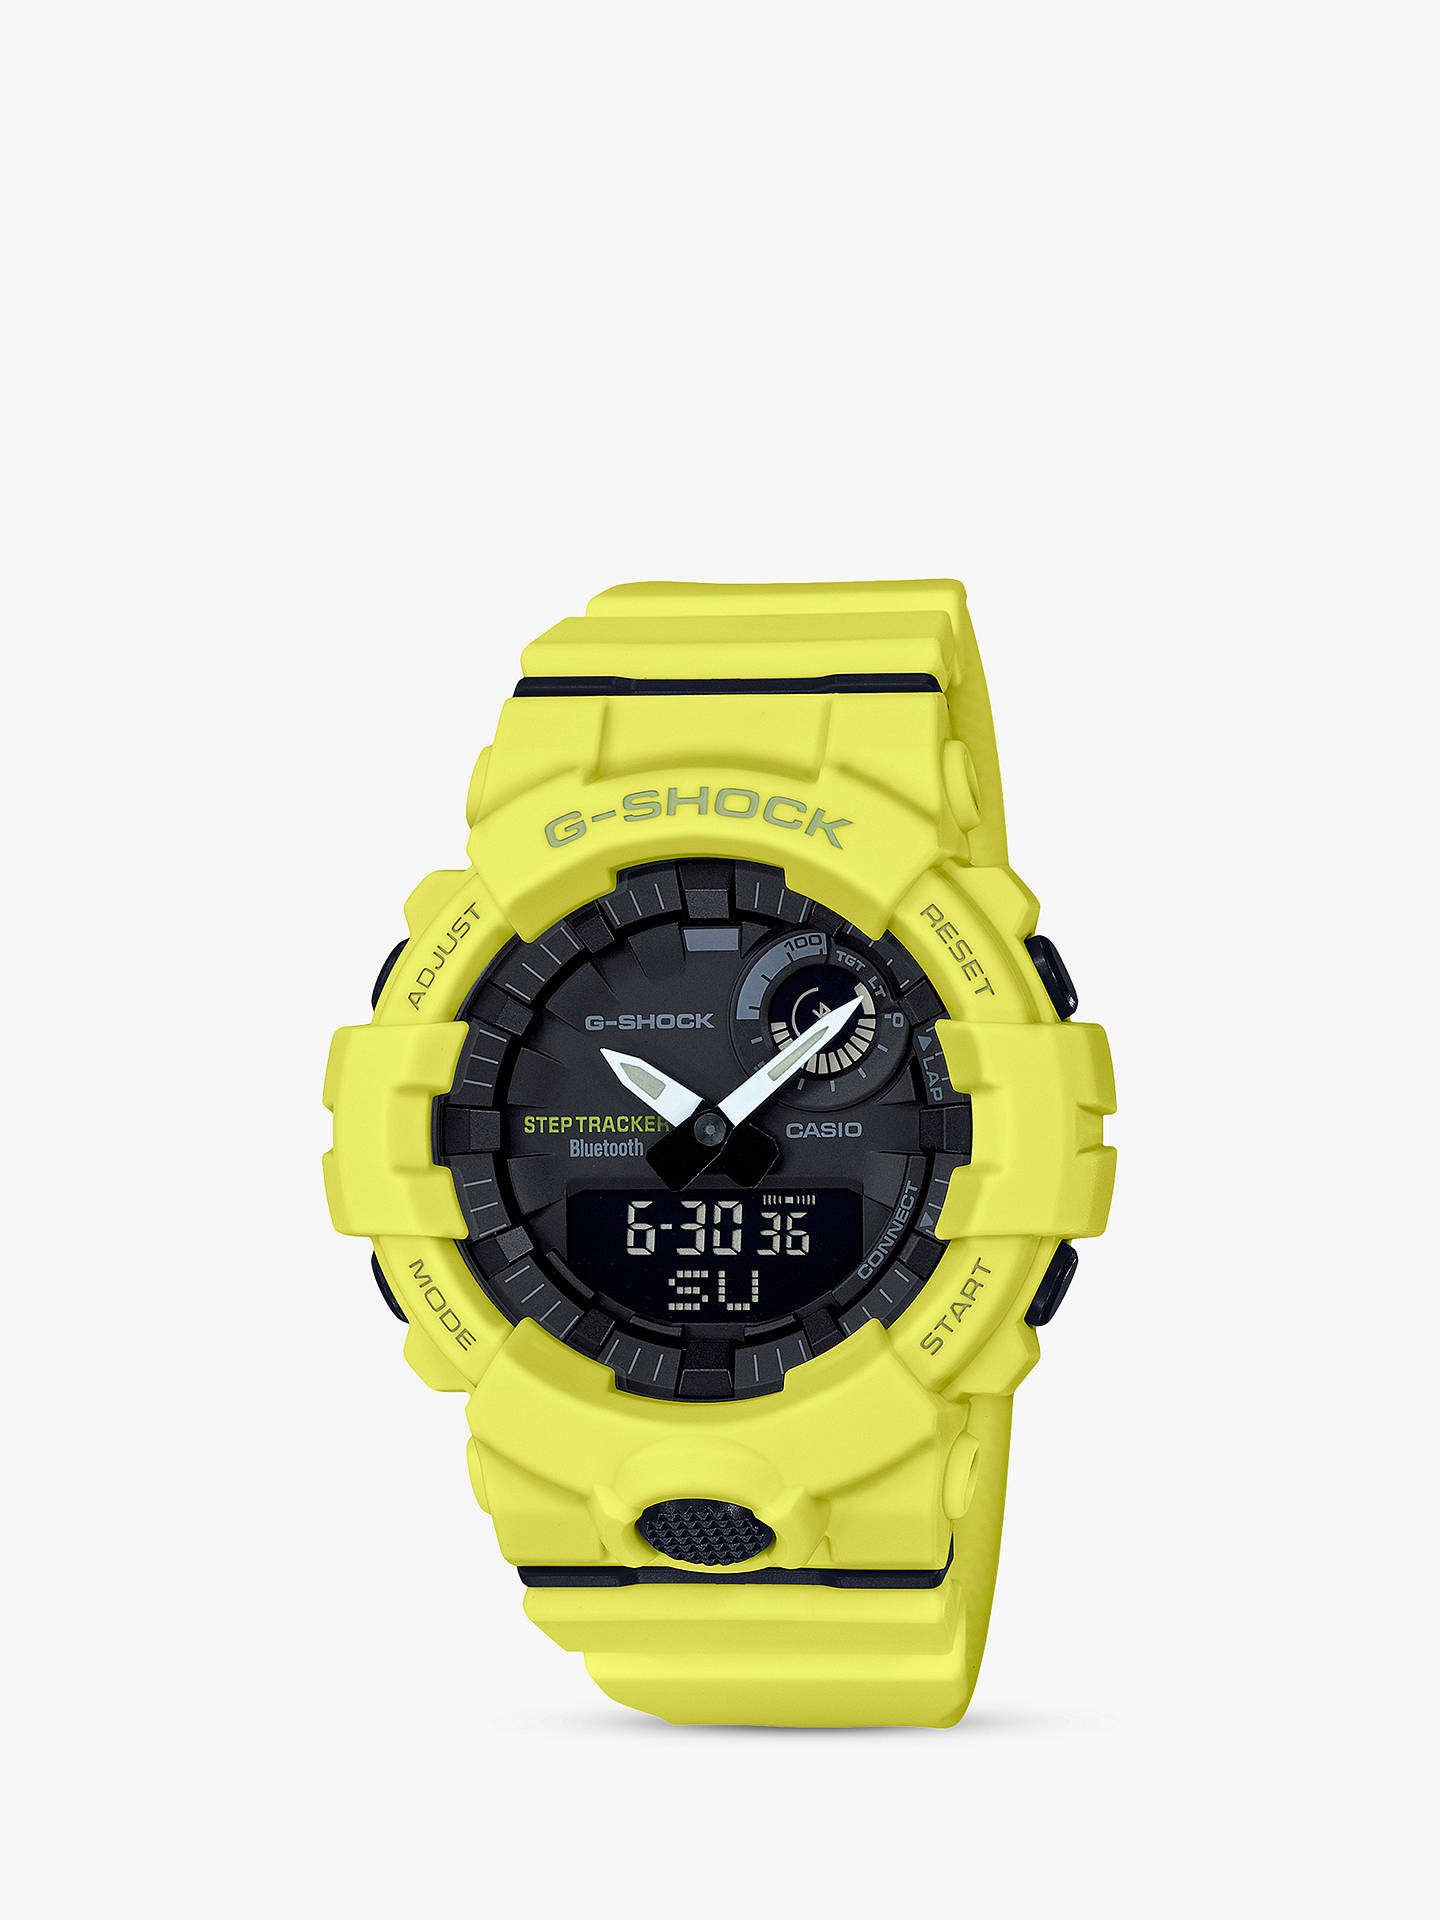 7c11fd22f04c Buy Casio Men's G-Shock Step Tracker Bluetooth Resin Strap Watch,  Yellow/Black ...